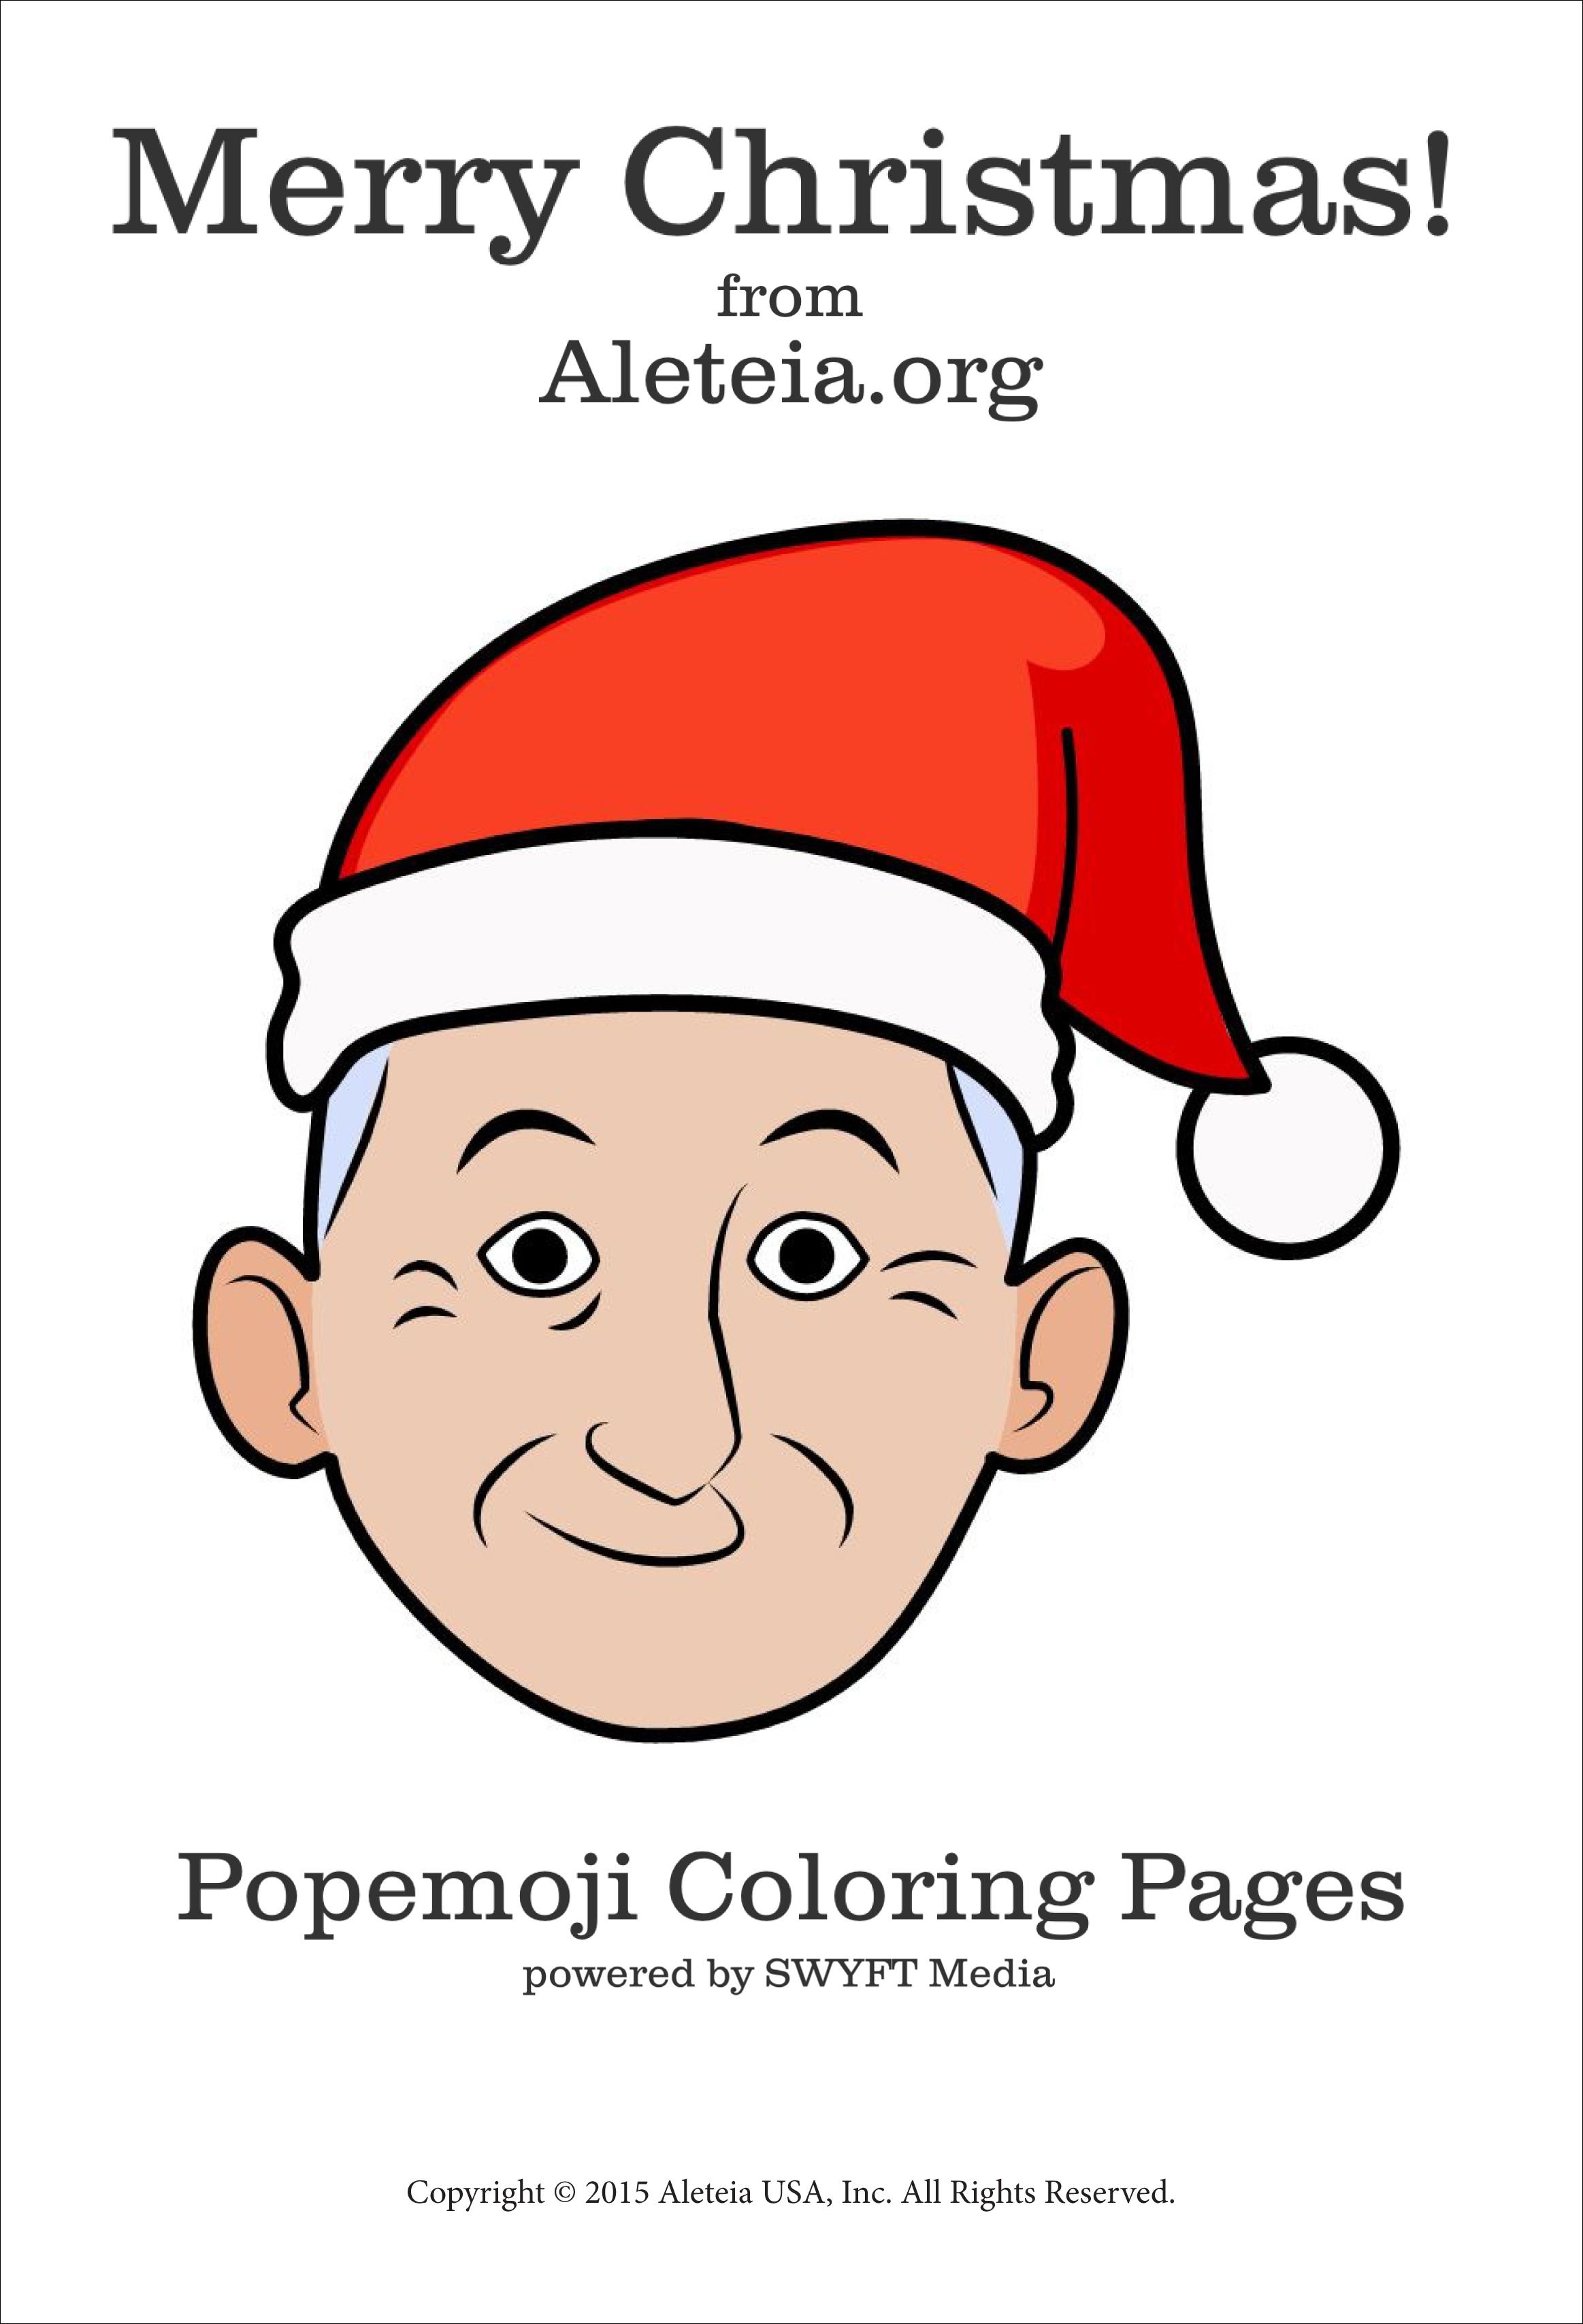 Popemoji_Christmas_Coloring